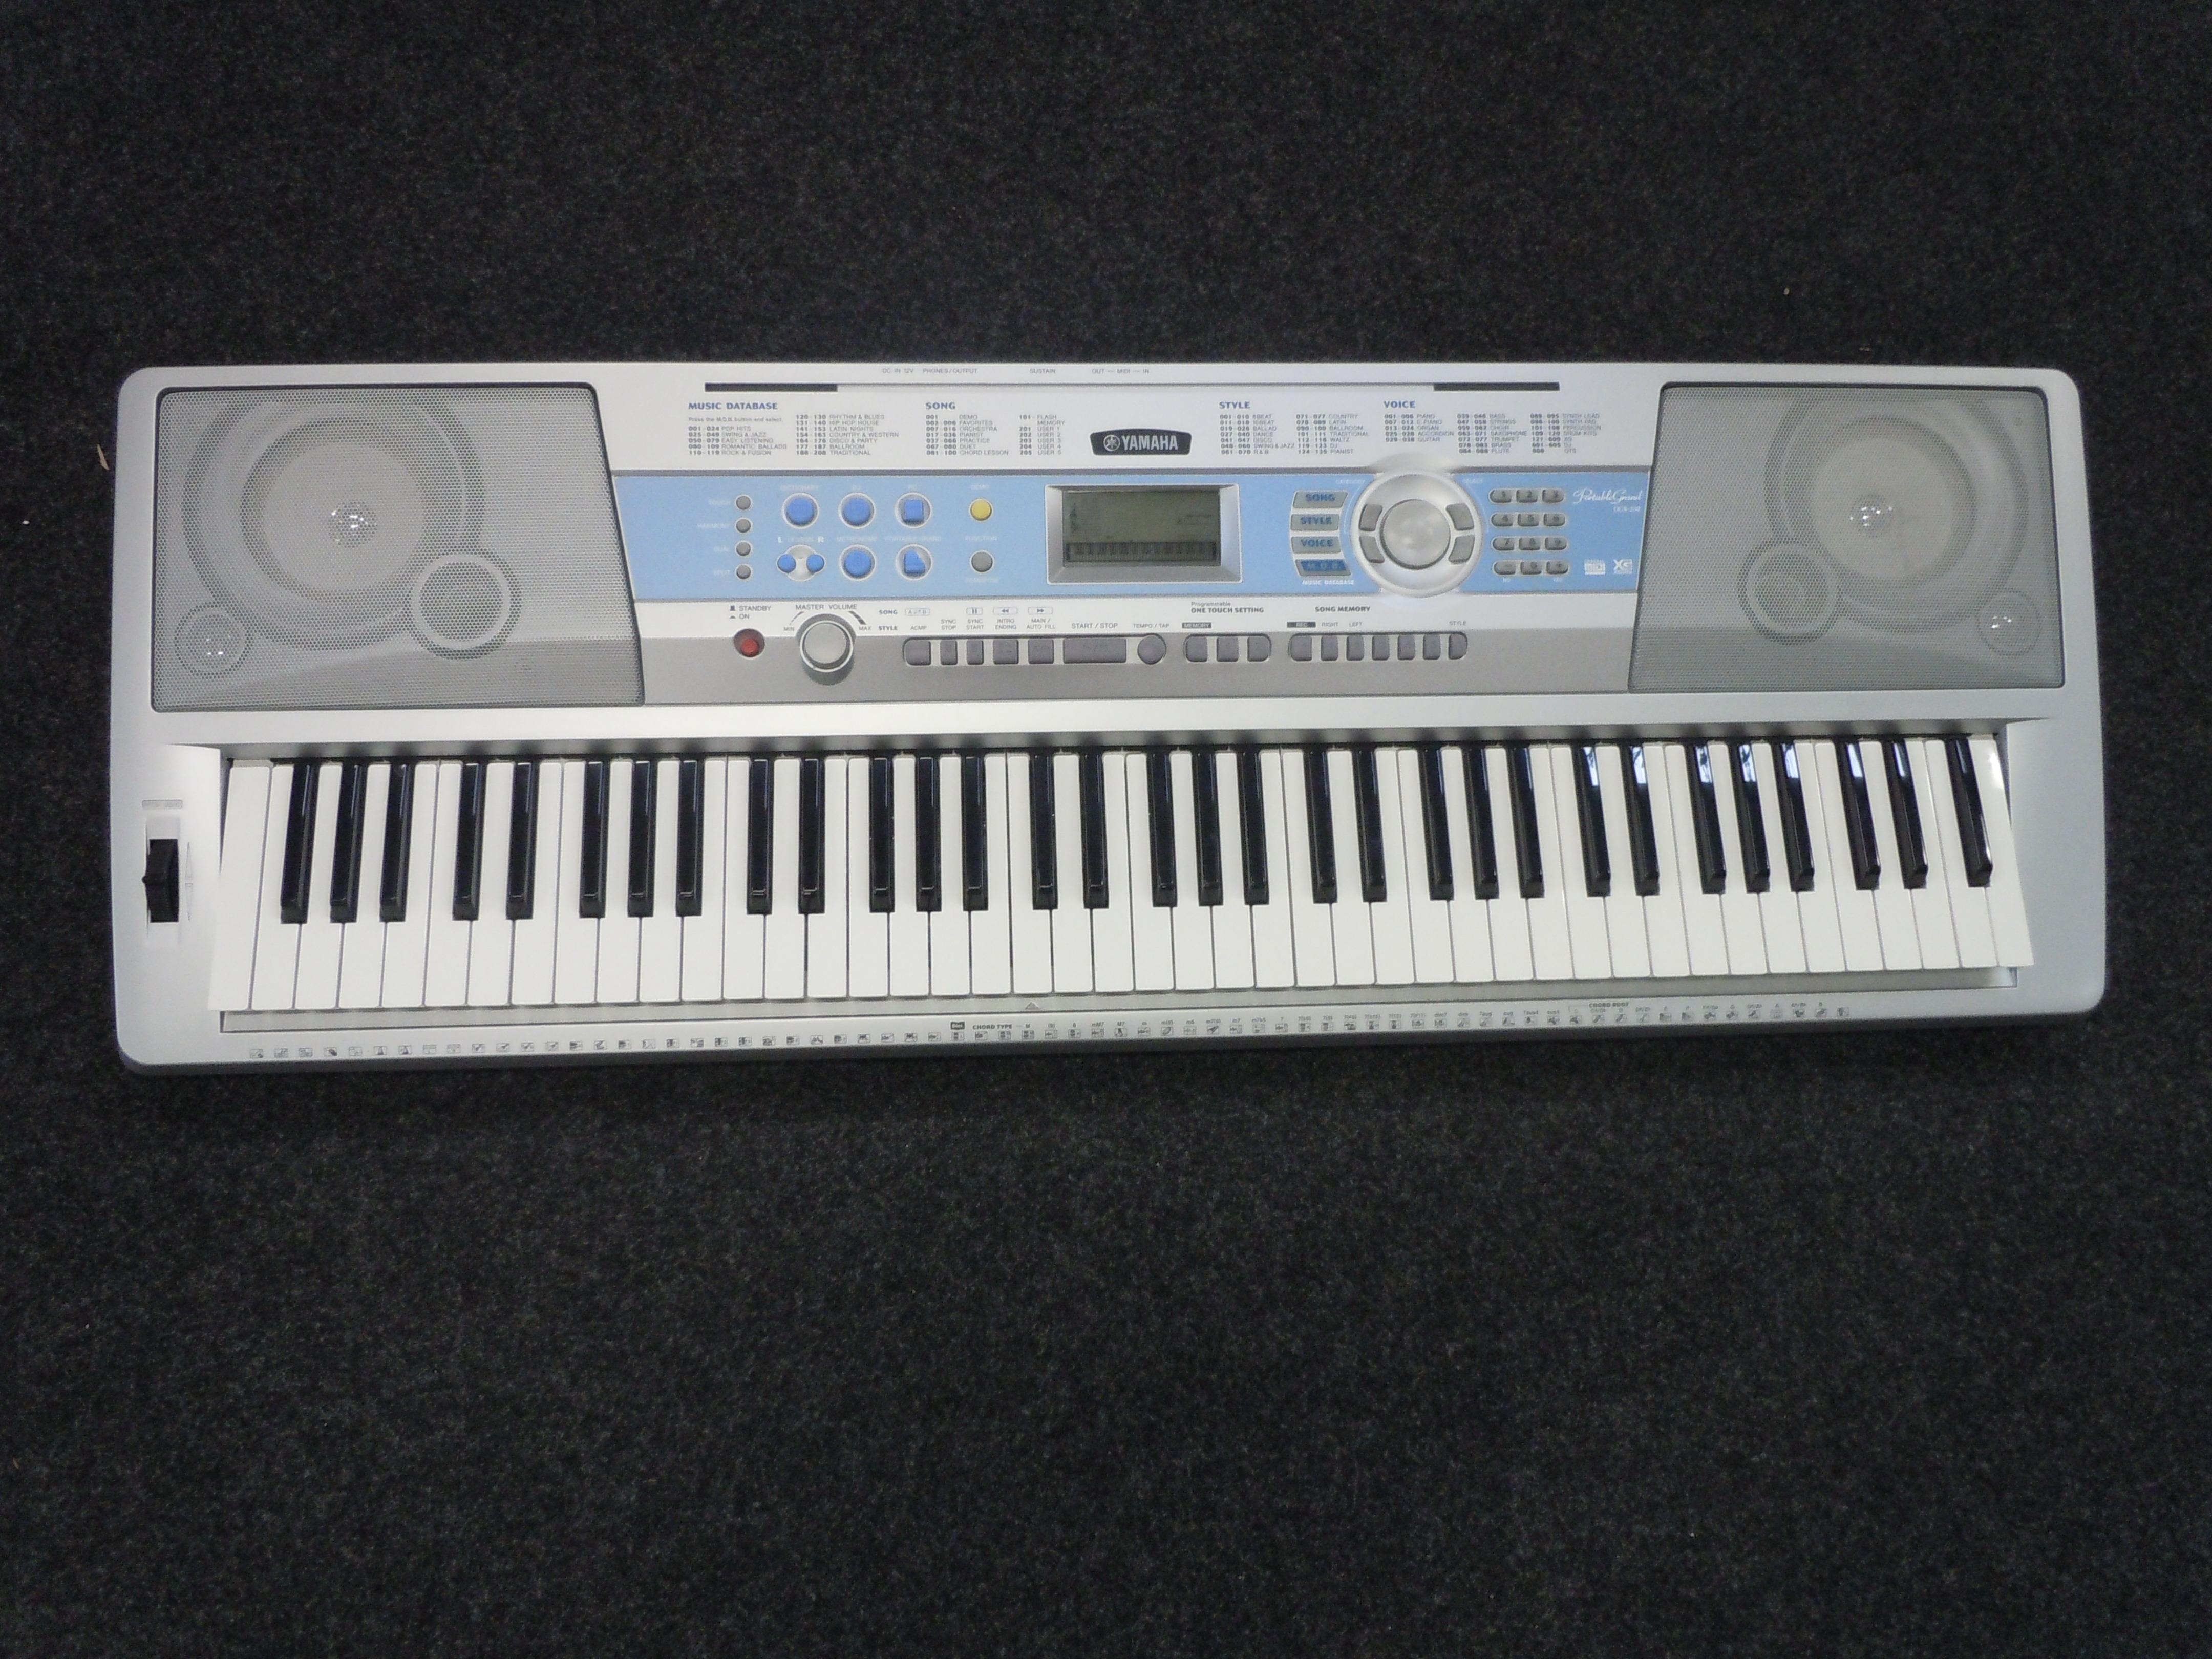 DGX-200